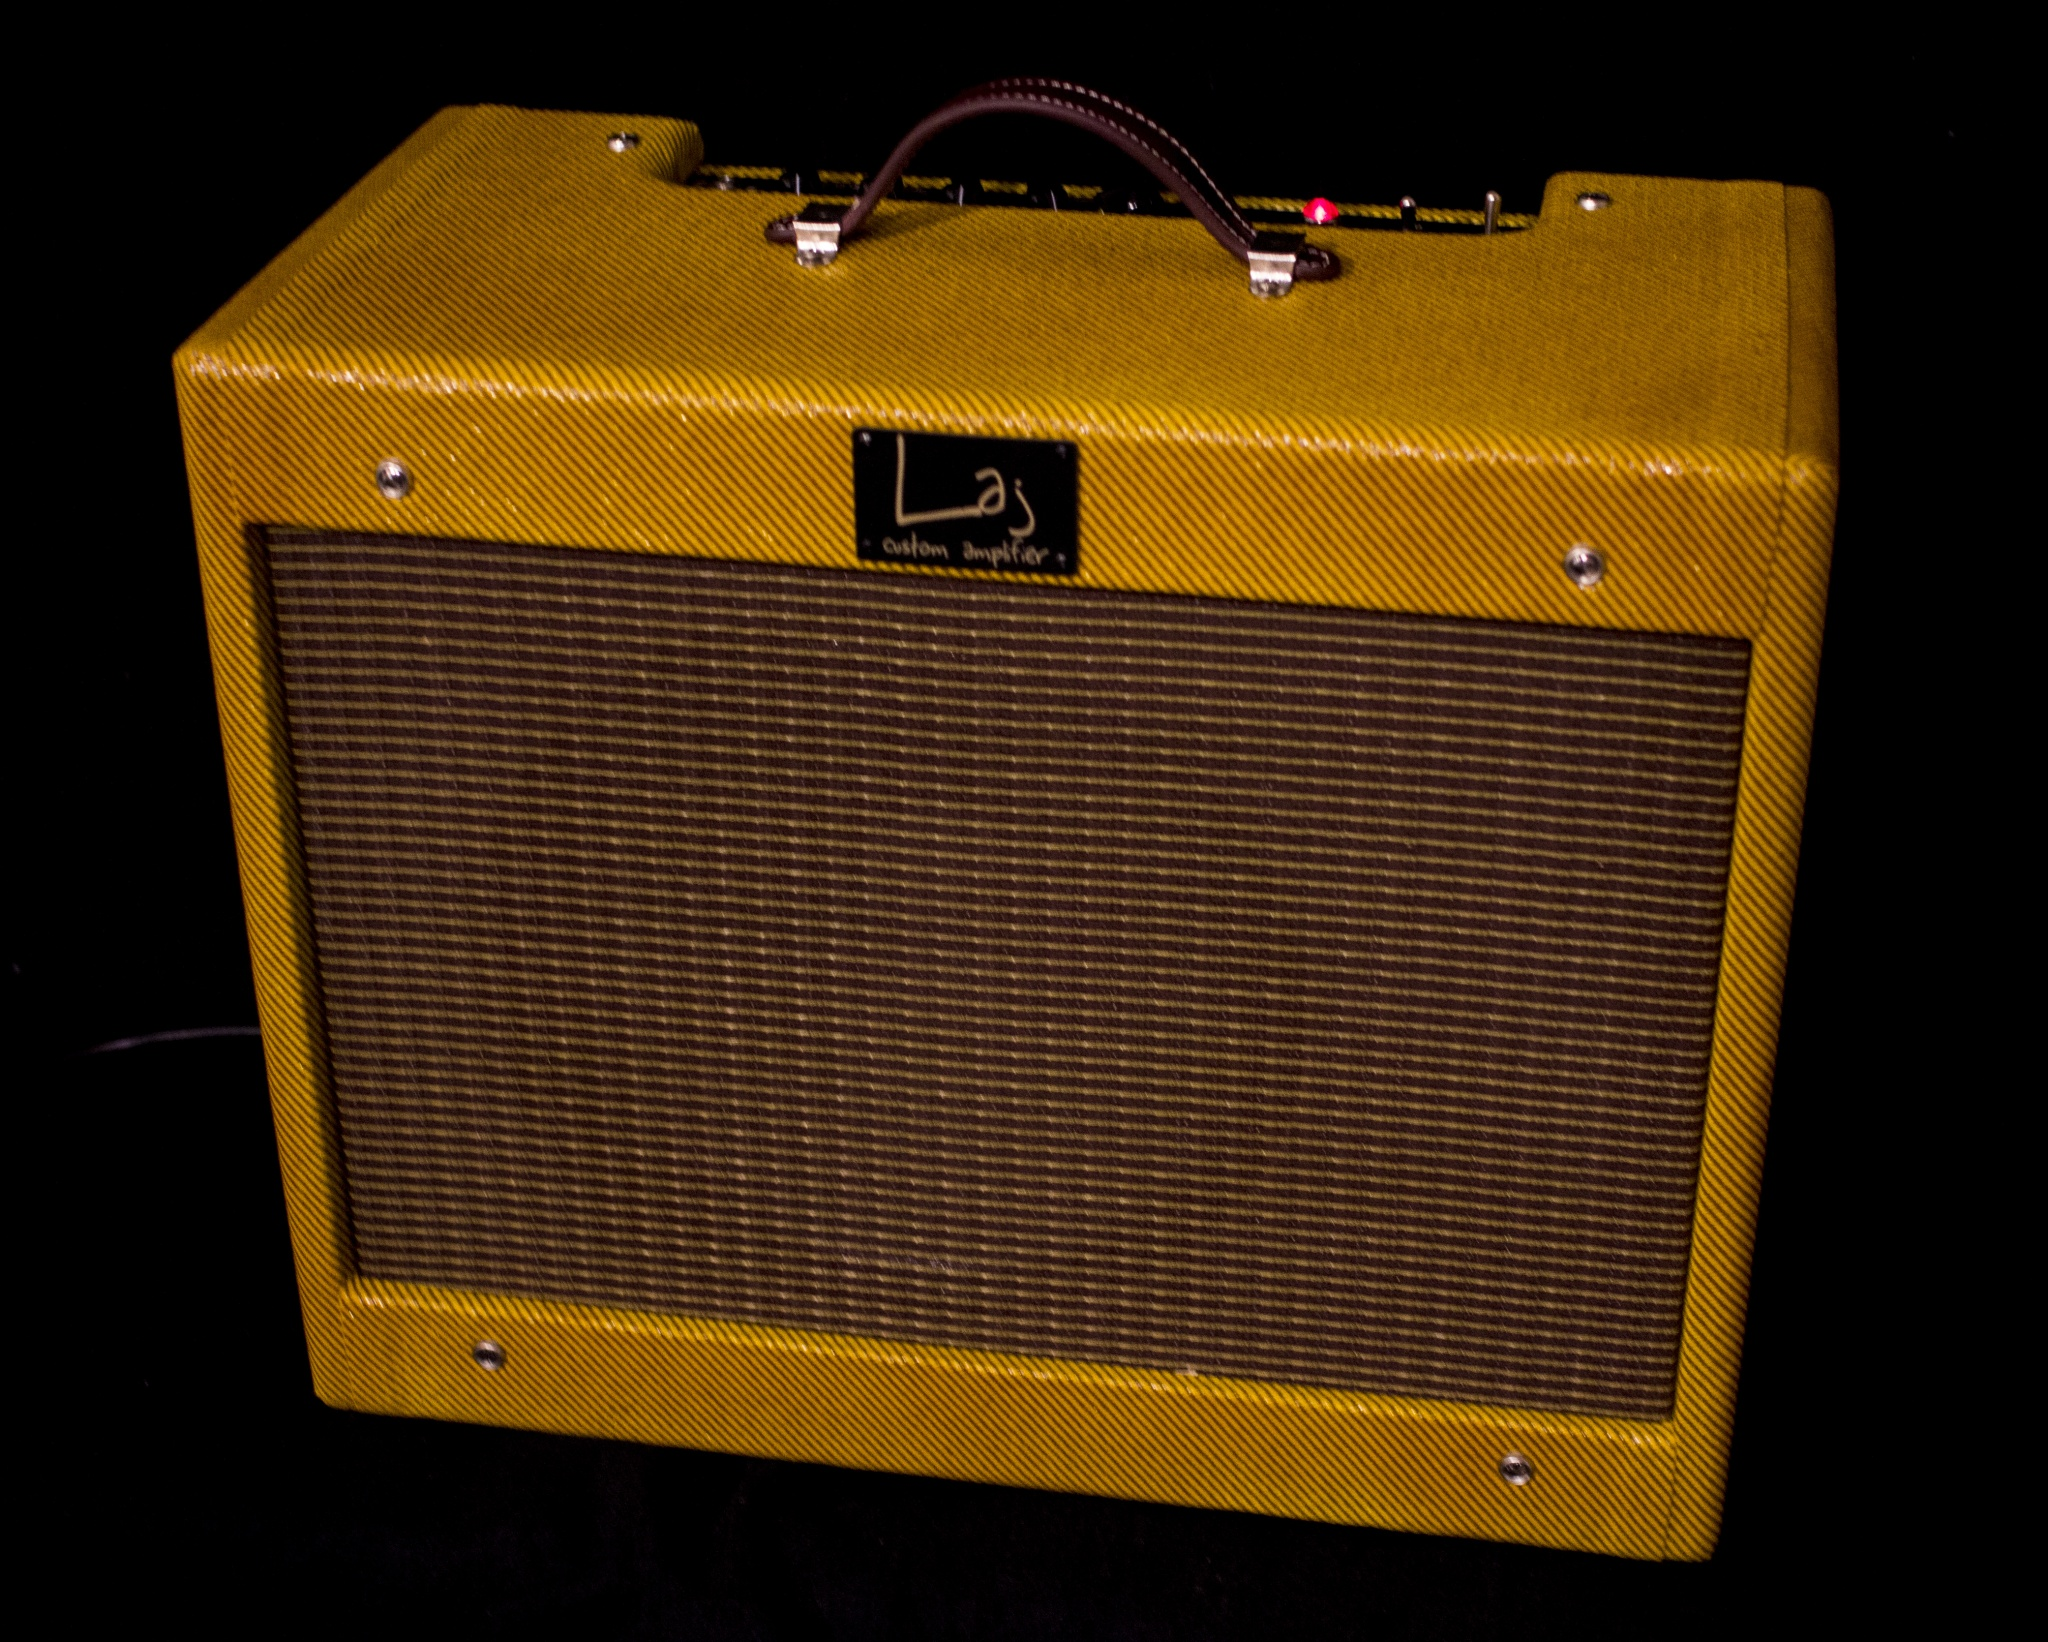 IMG 2166 - Amplificador LAJ Speed Reverb